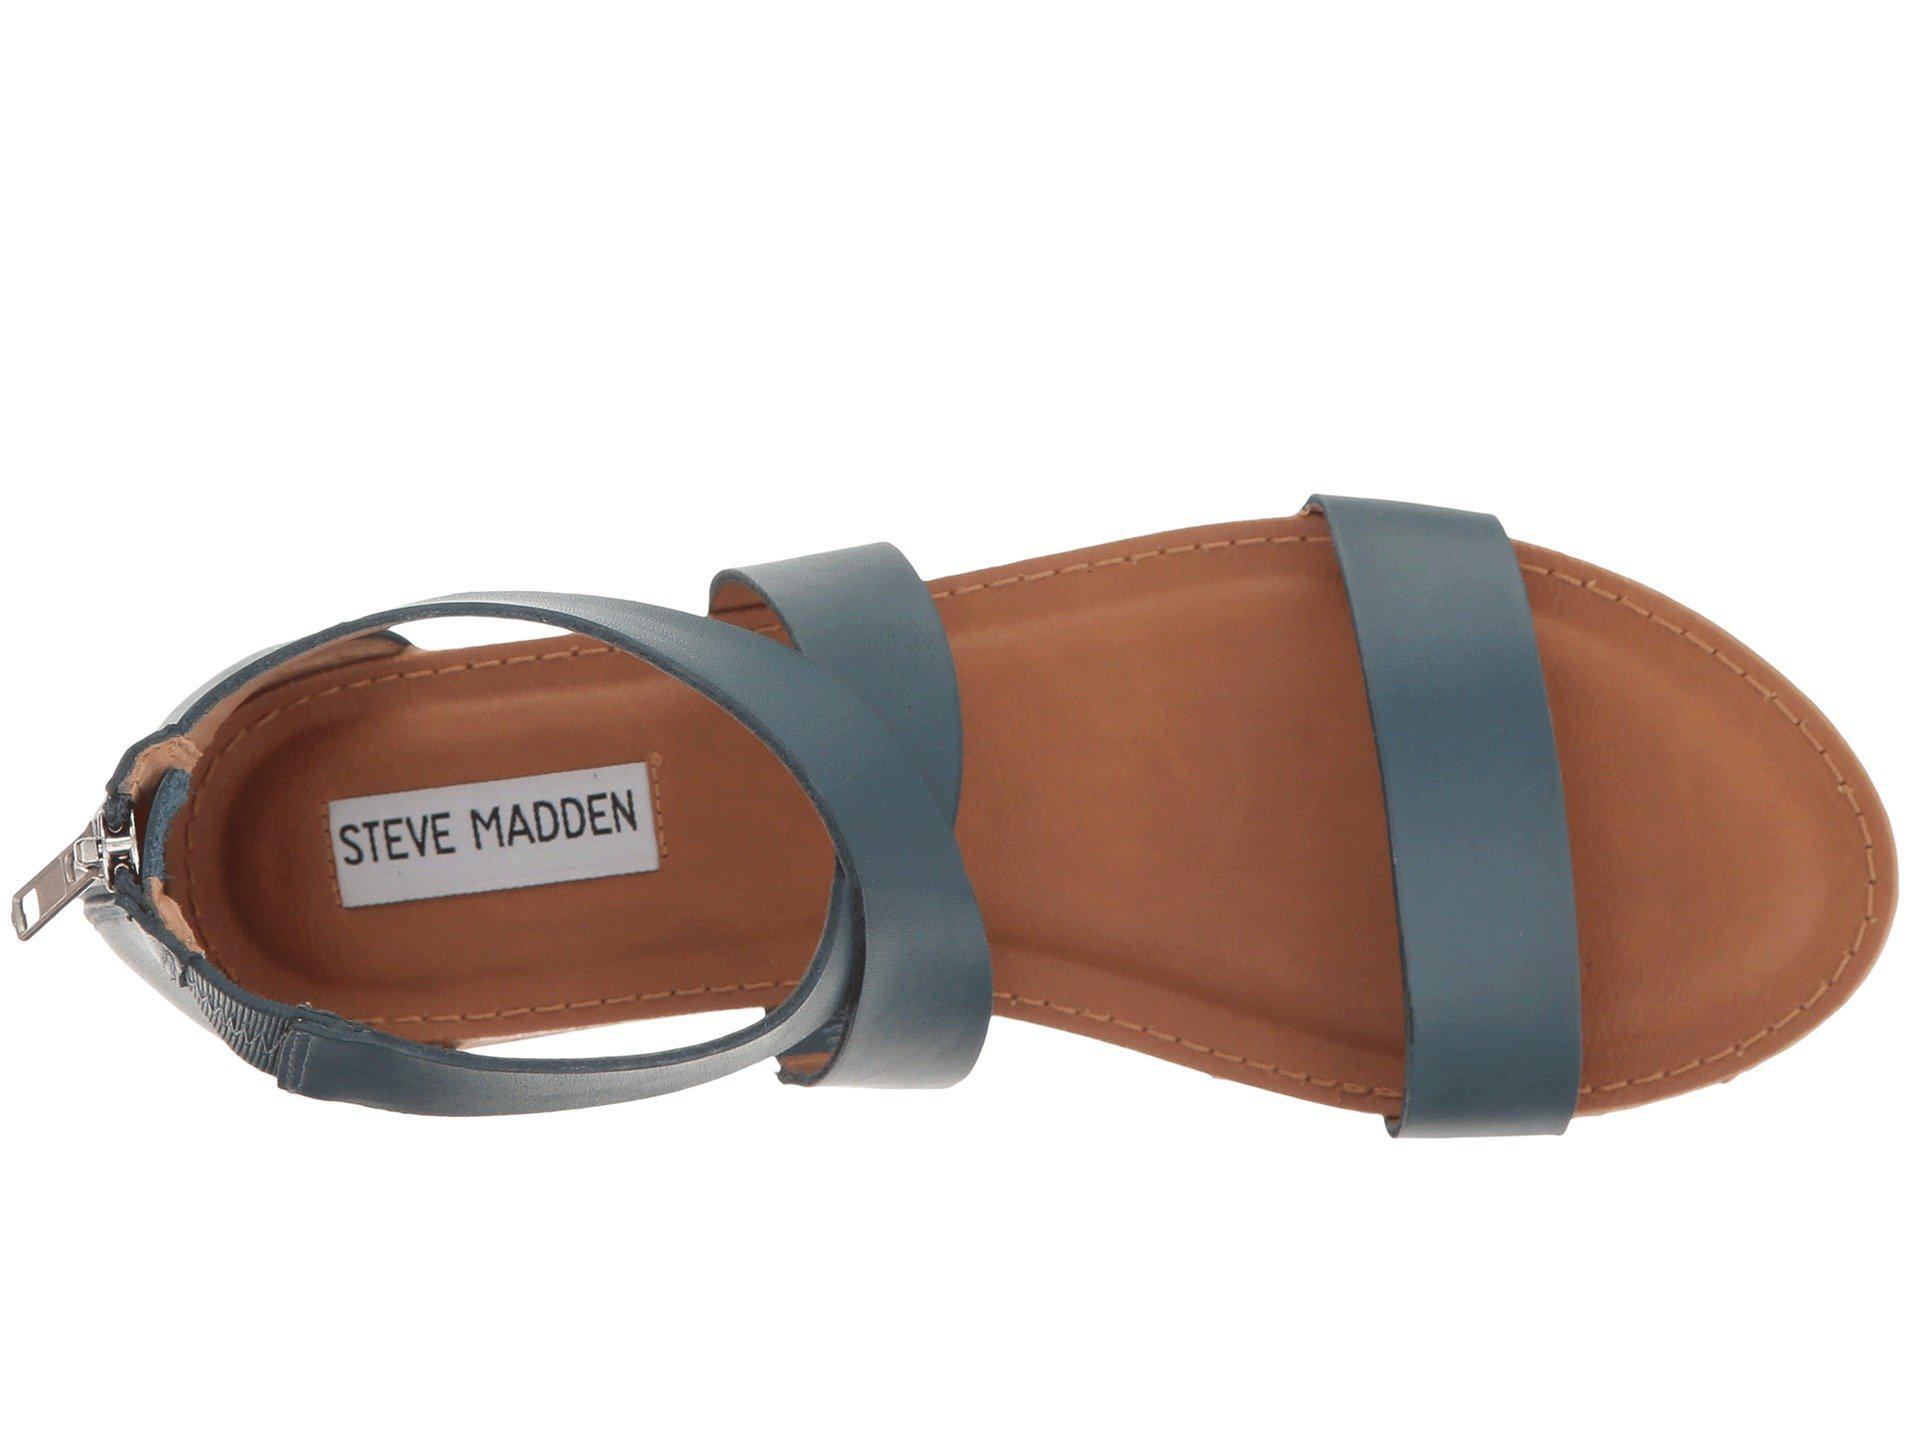 331a6977f886 Lyst - Steve Madden Halley Flat Sandal in Blue